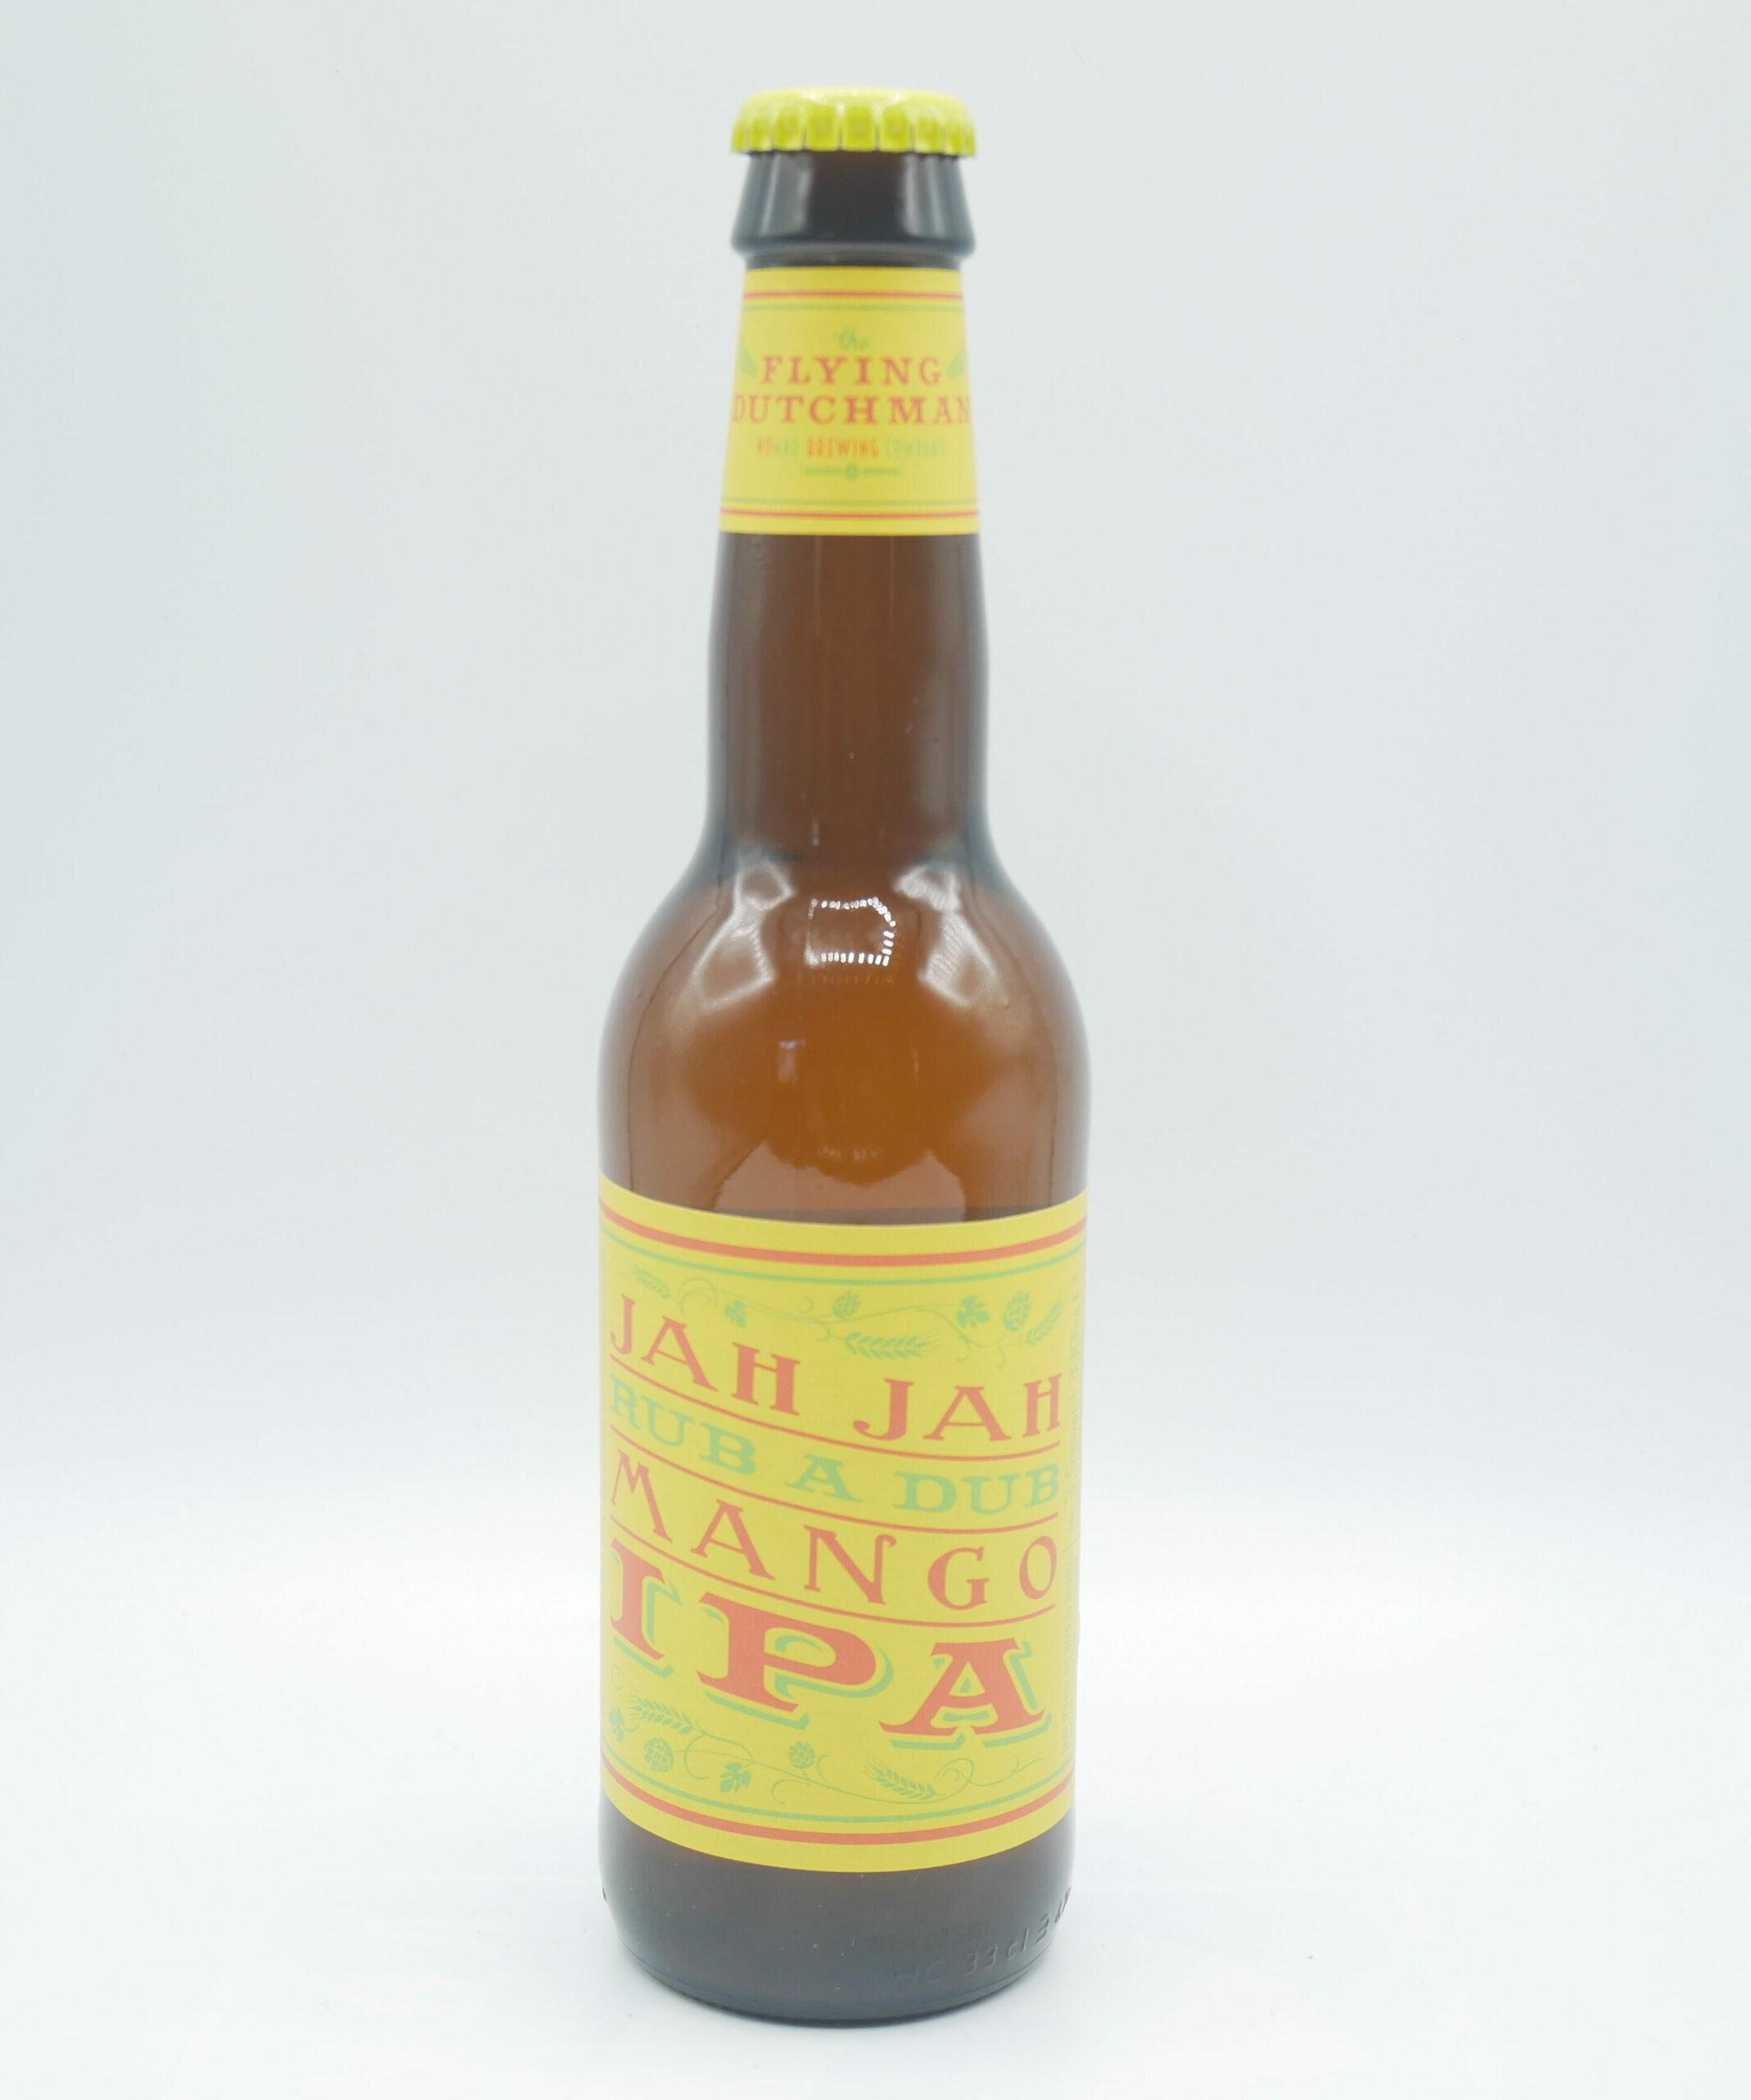 Img Jah jah rub a dub Mango ipa